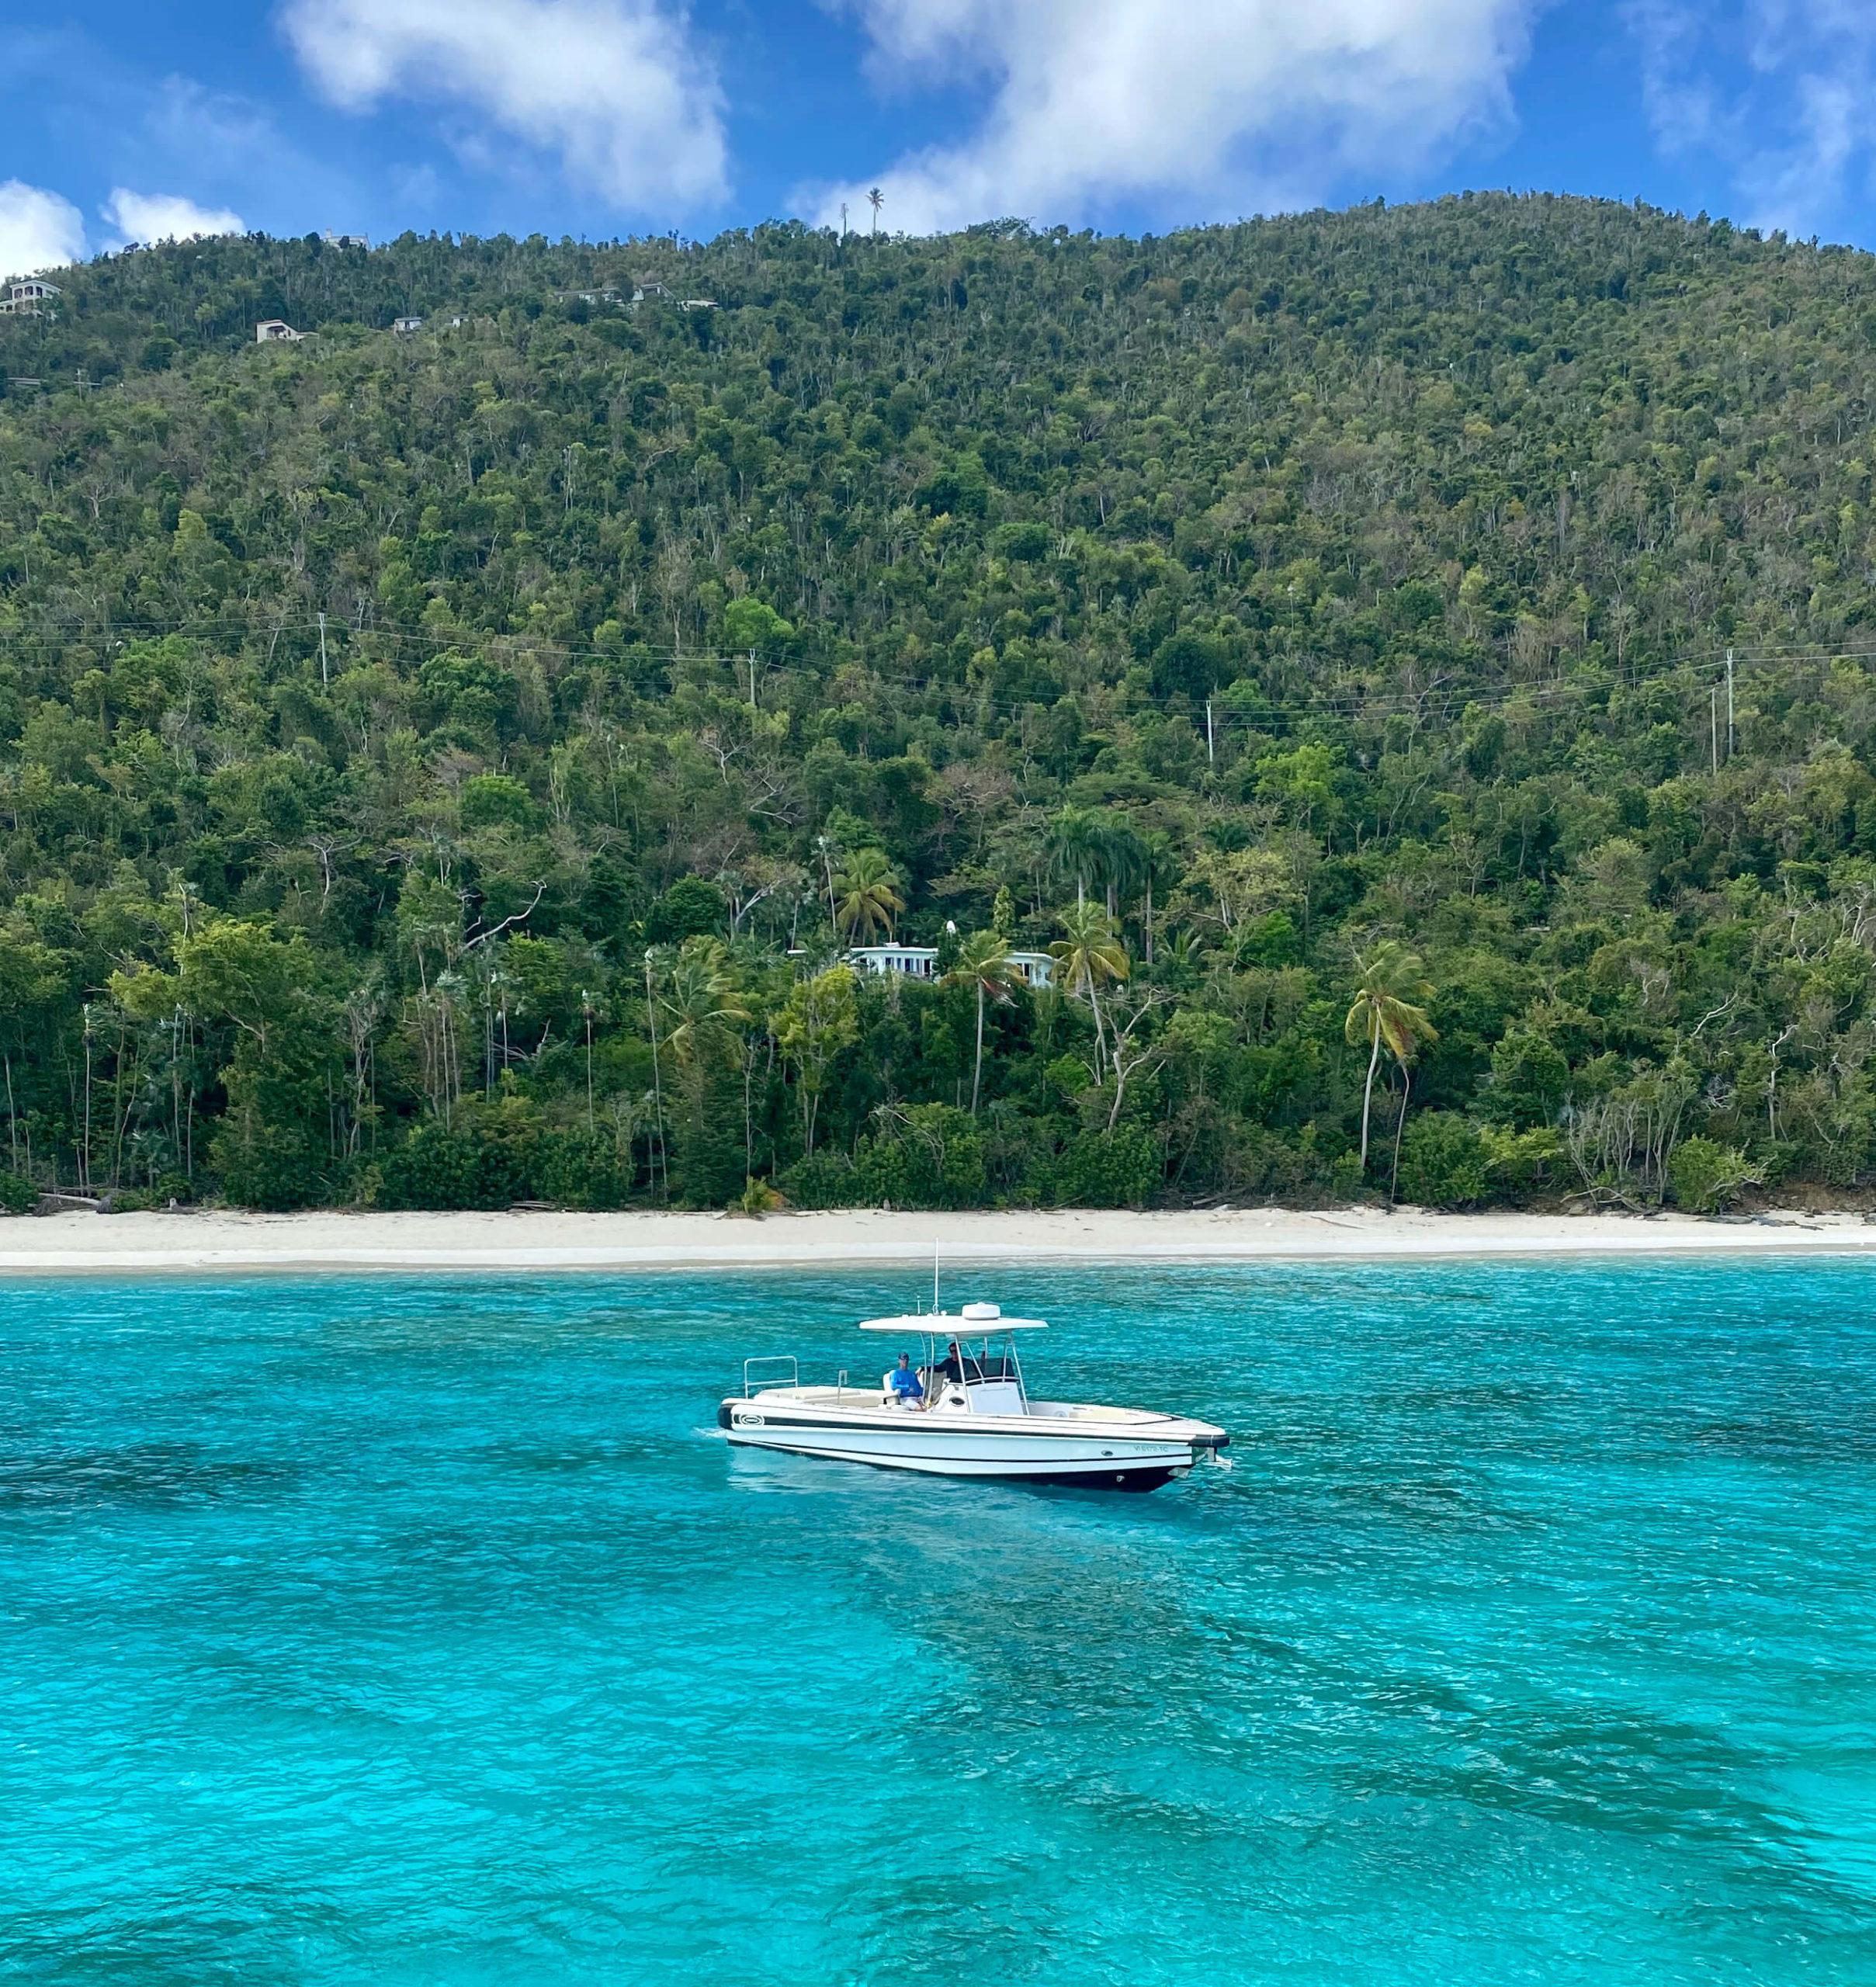 island chaser